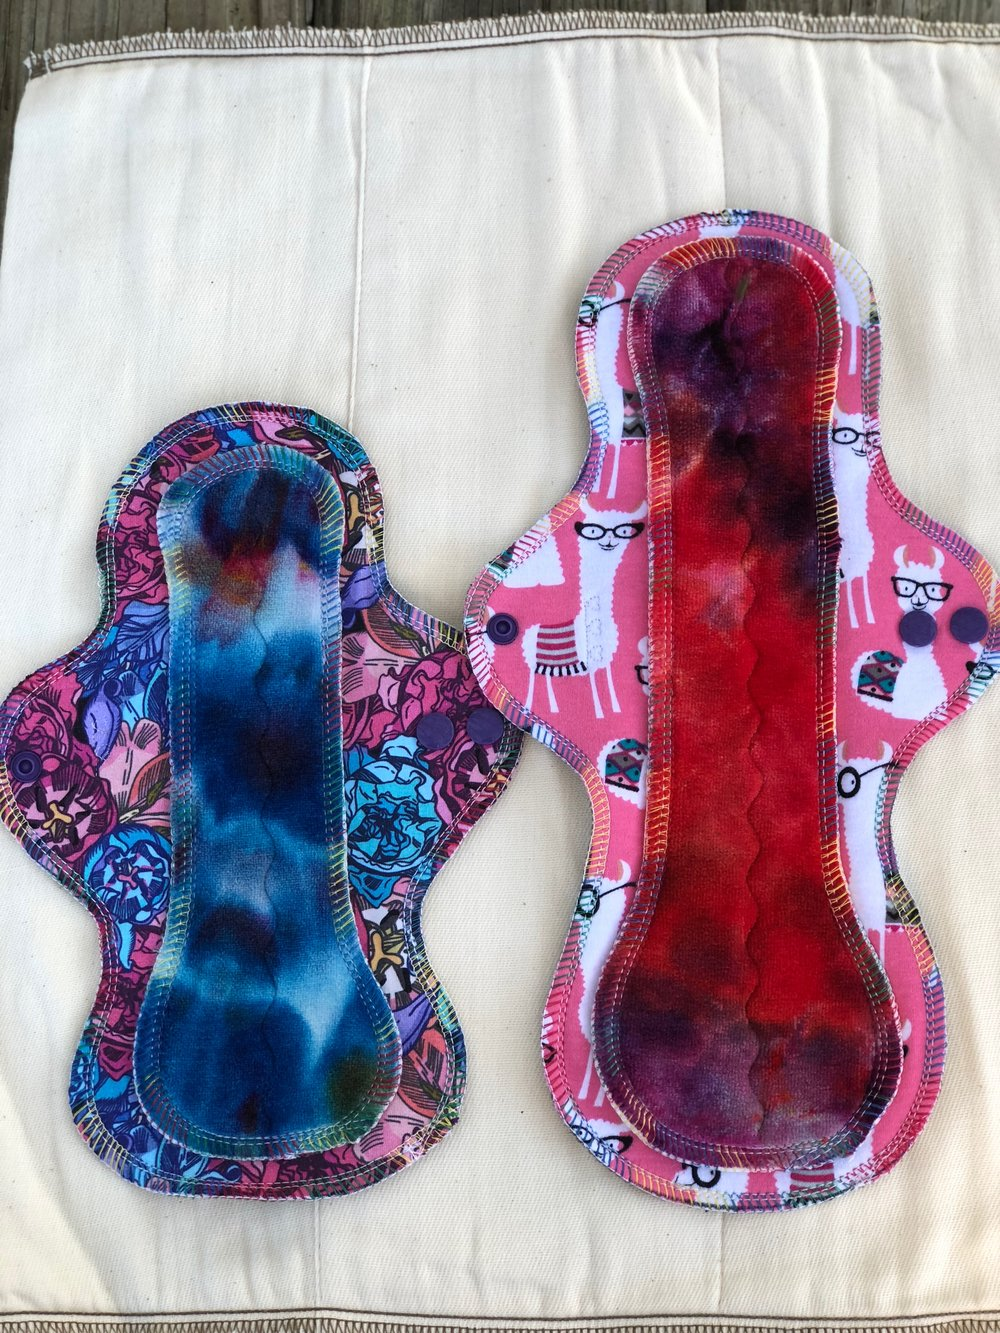 Cloth Menstrual Pads Size Comparison.jpeg